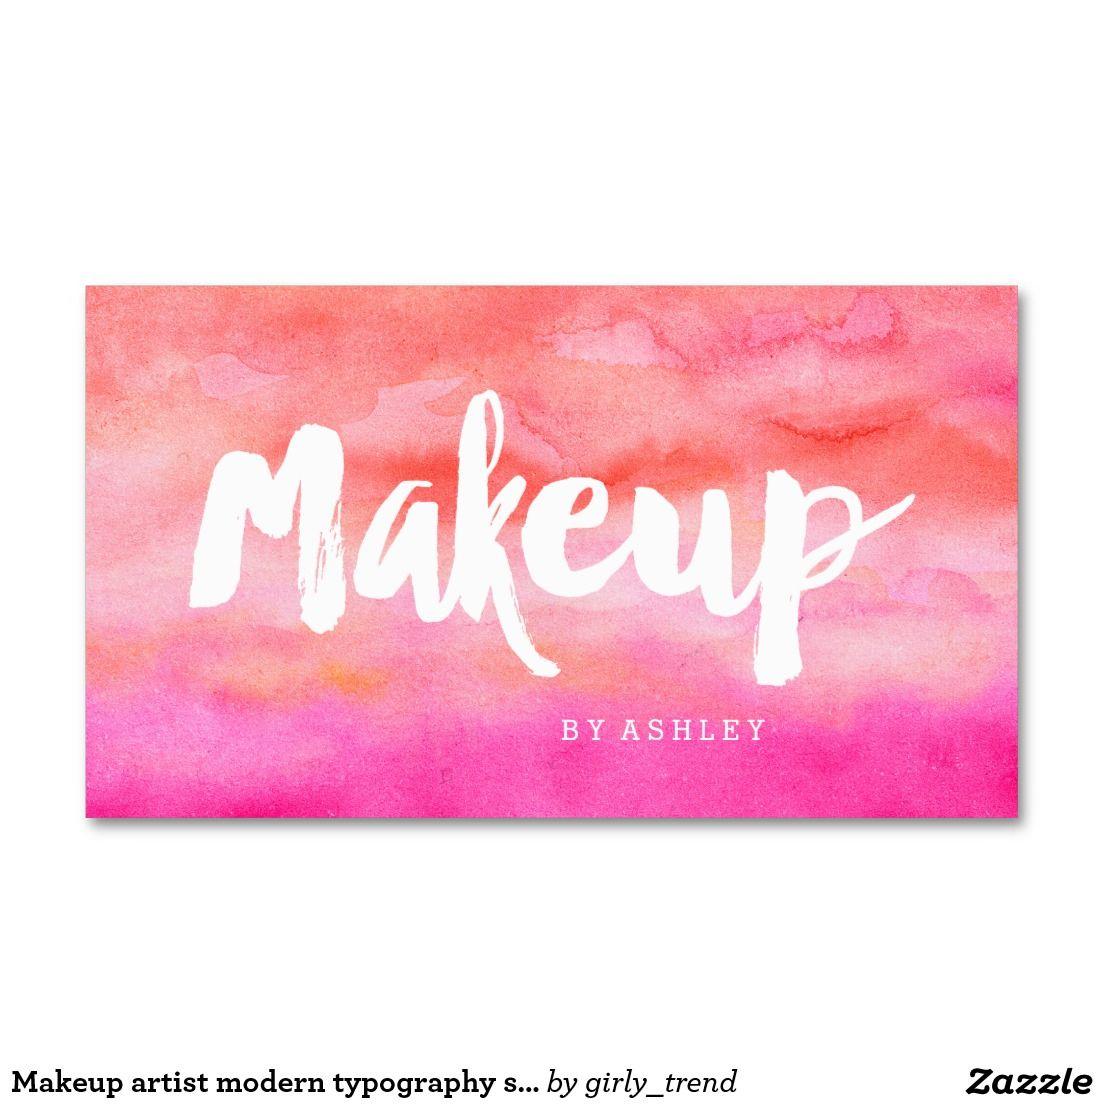 Makeup artist modern typography sunset watercolor business card makeup artist modern typography sunset watercolor business card reheart Image collections